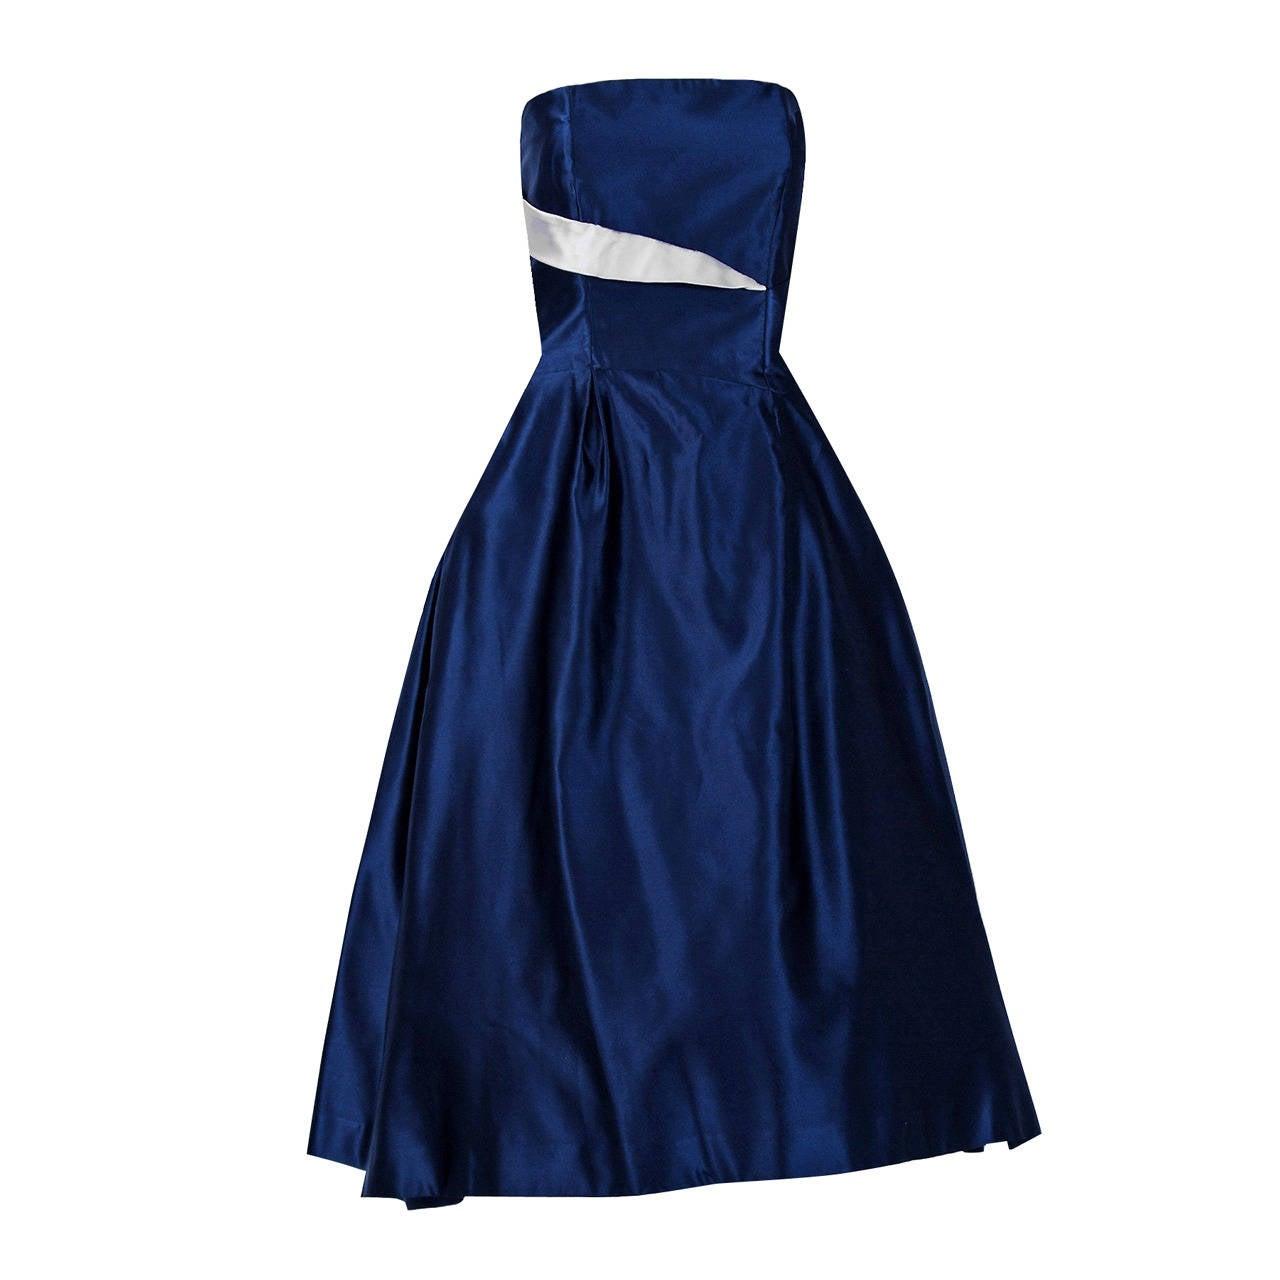 1950's Lanvin Castillo Haute-Couture Navy & Ivory Satin Strapless Dress Ensemble For Sale